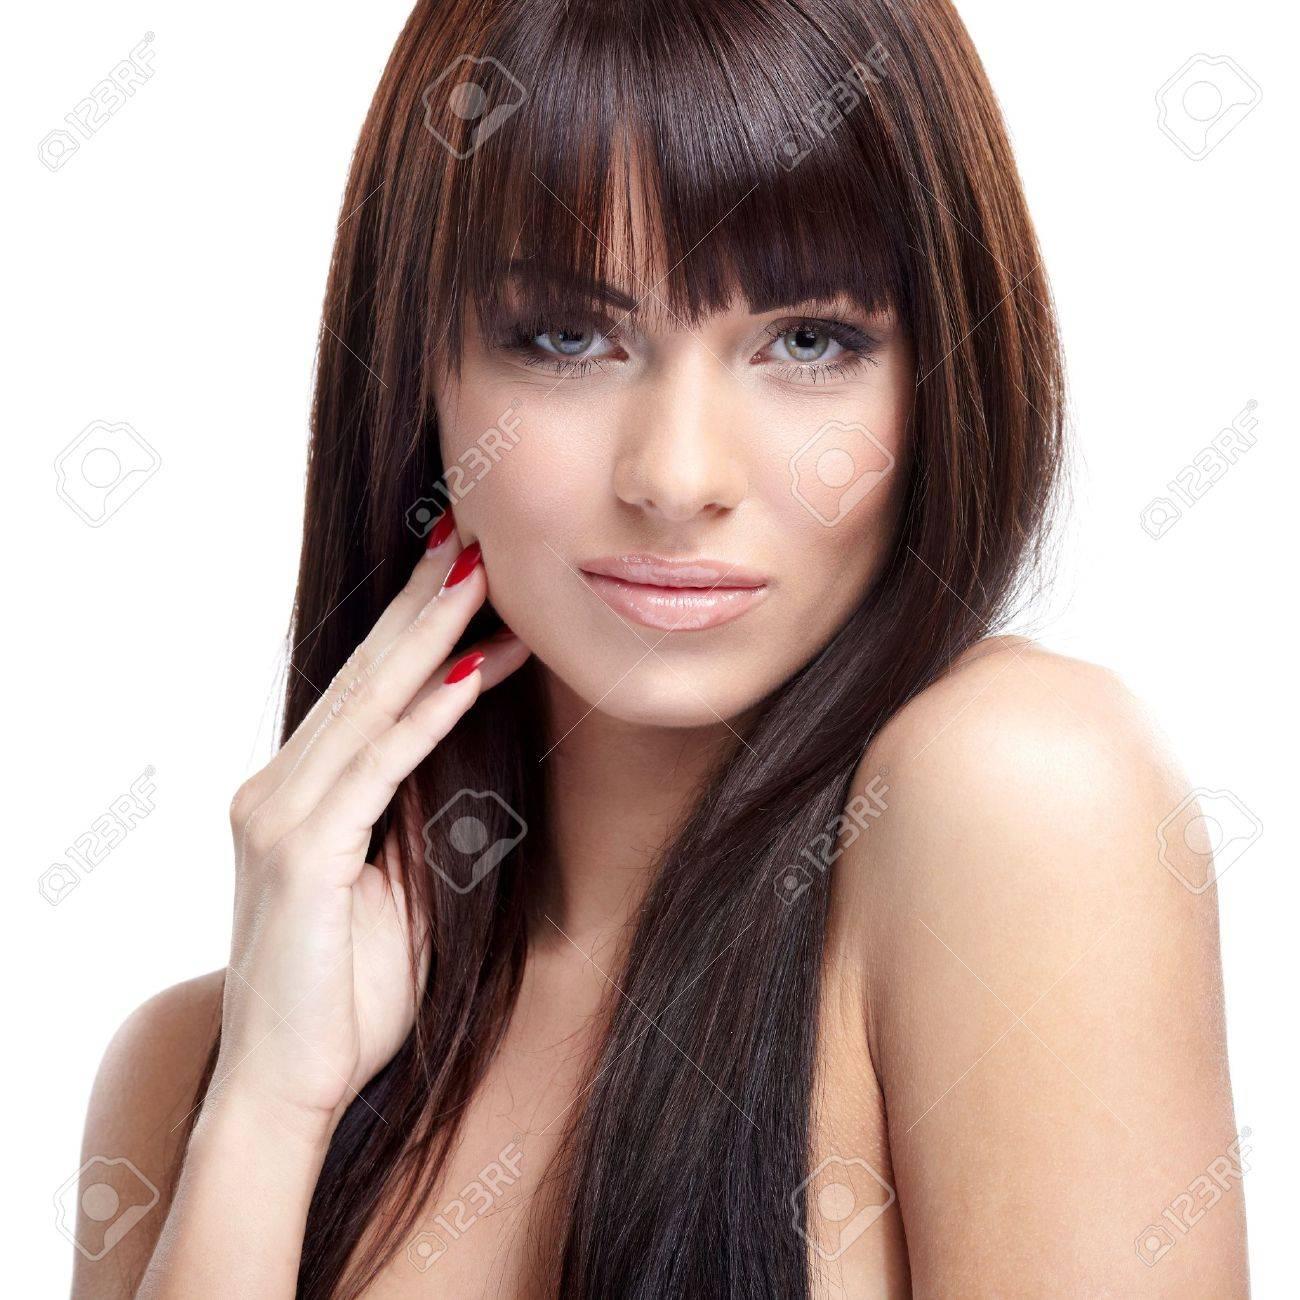 Portrait of beautiful female model on white background Stock Photo - 16551601